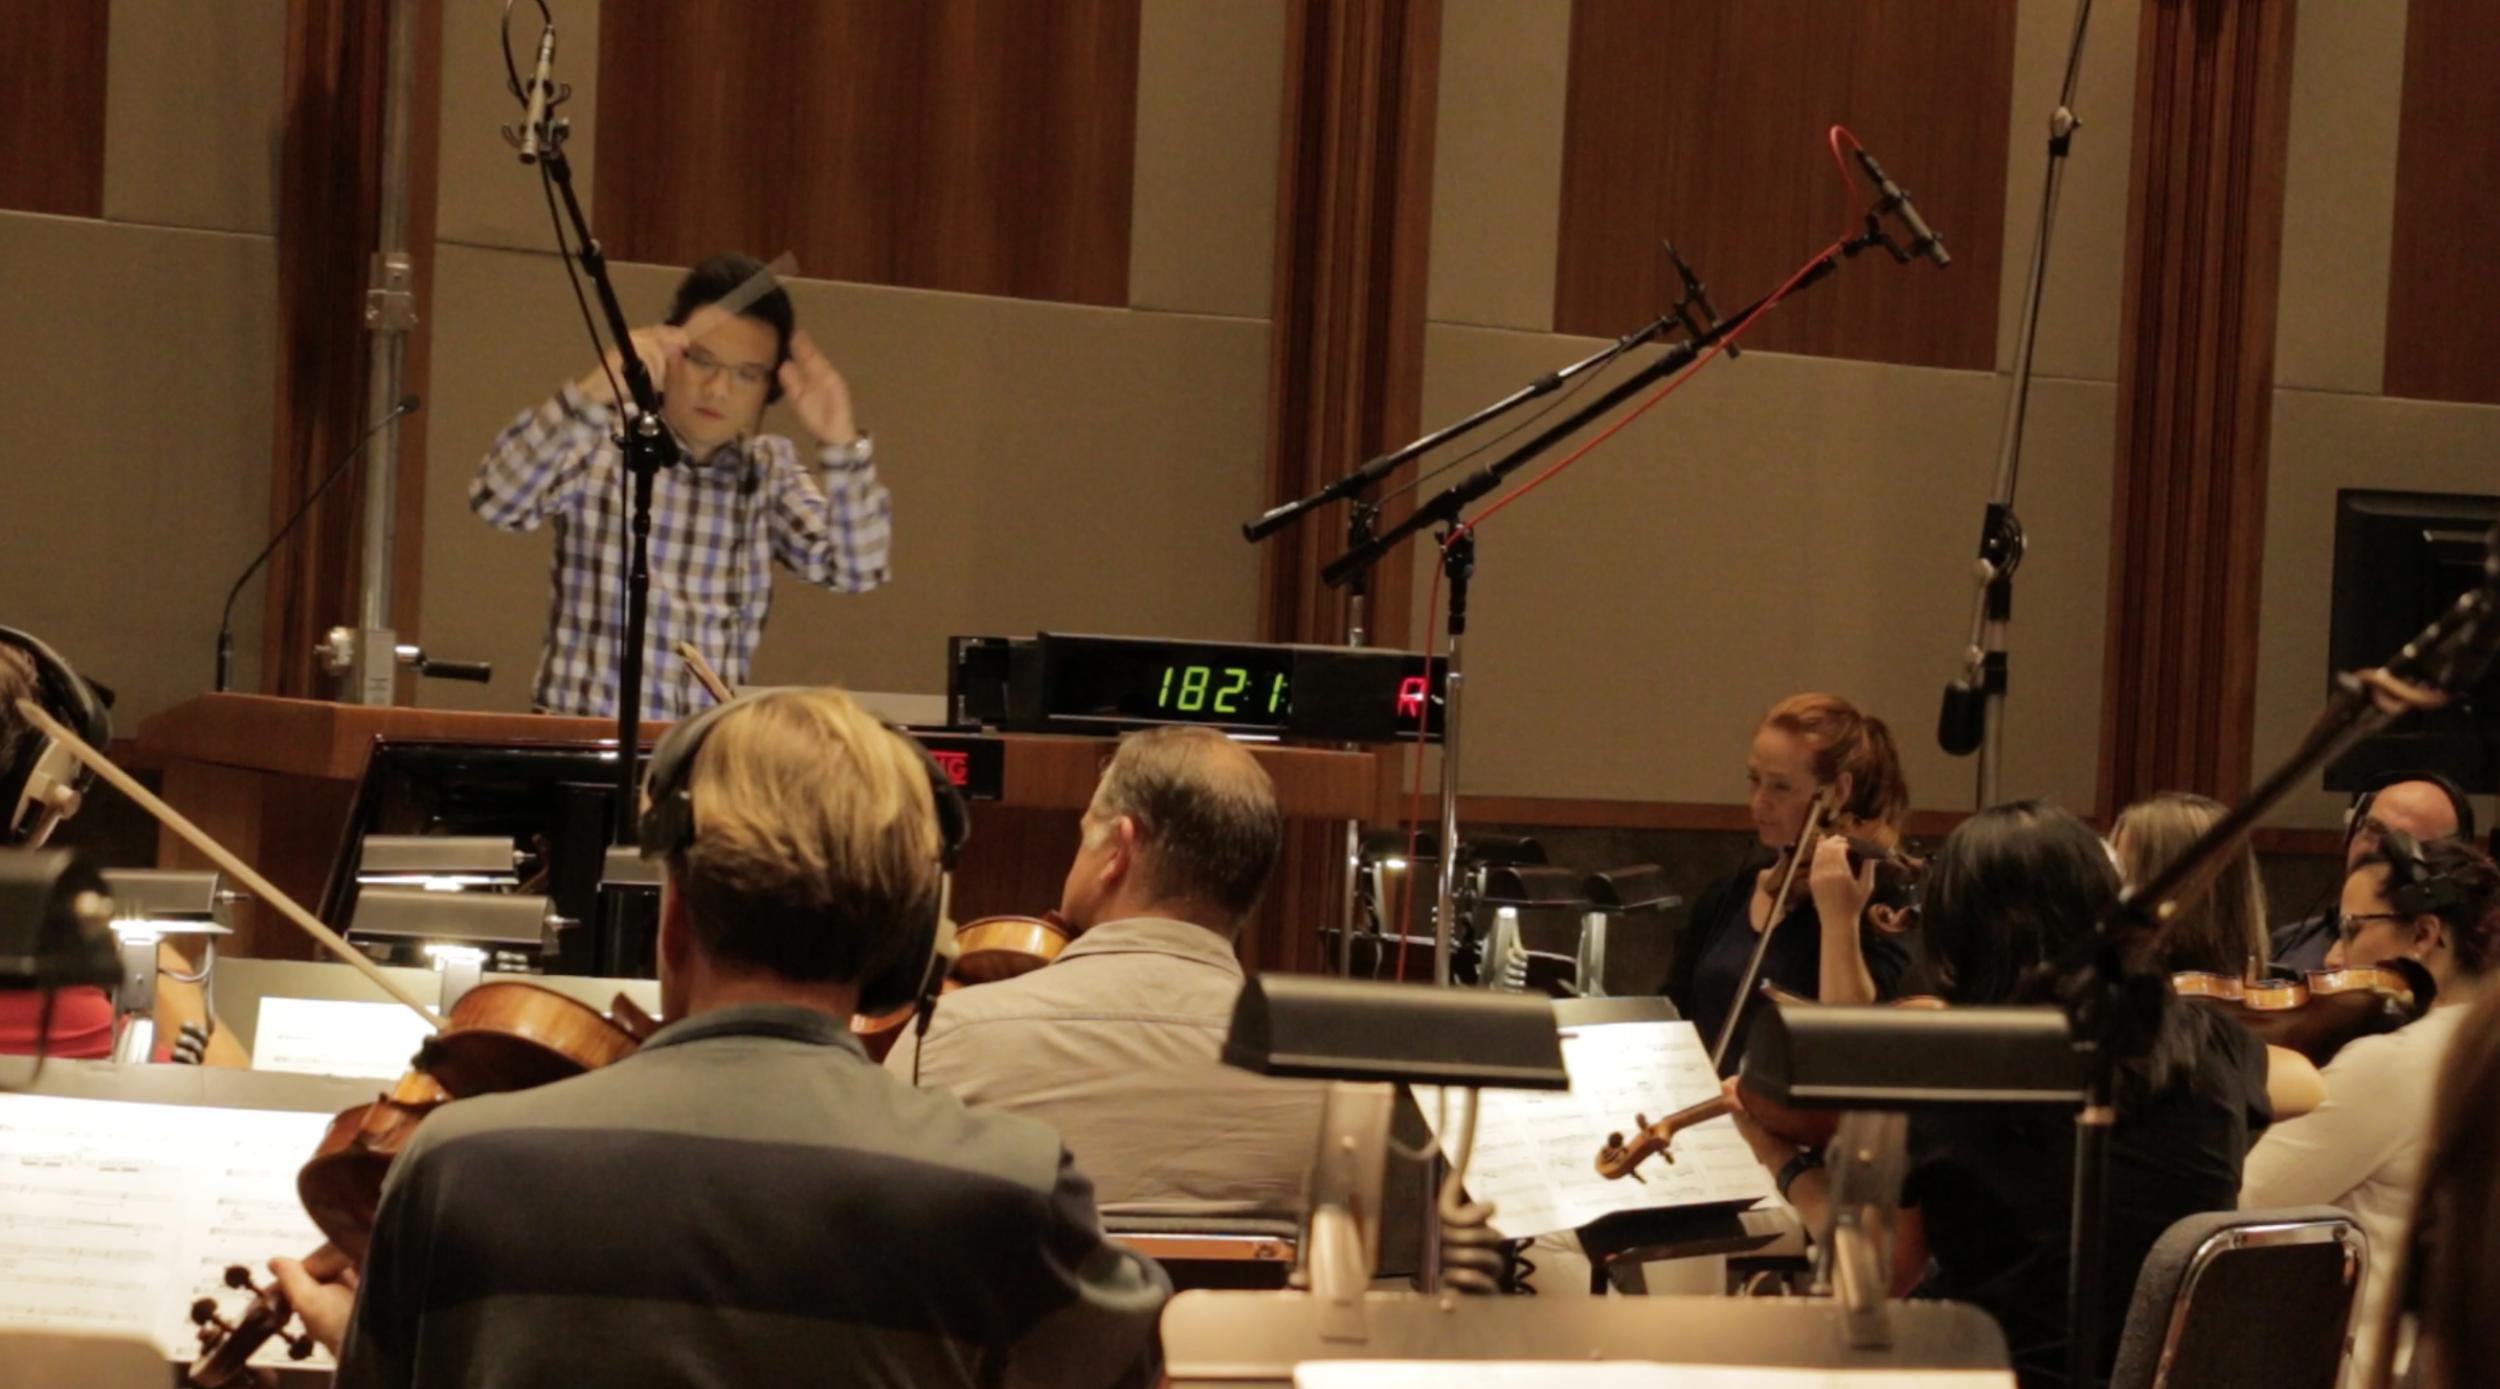 Recording at The Bridge-Glendale, CA